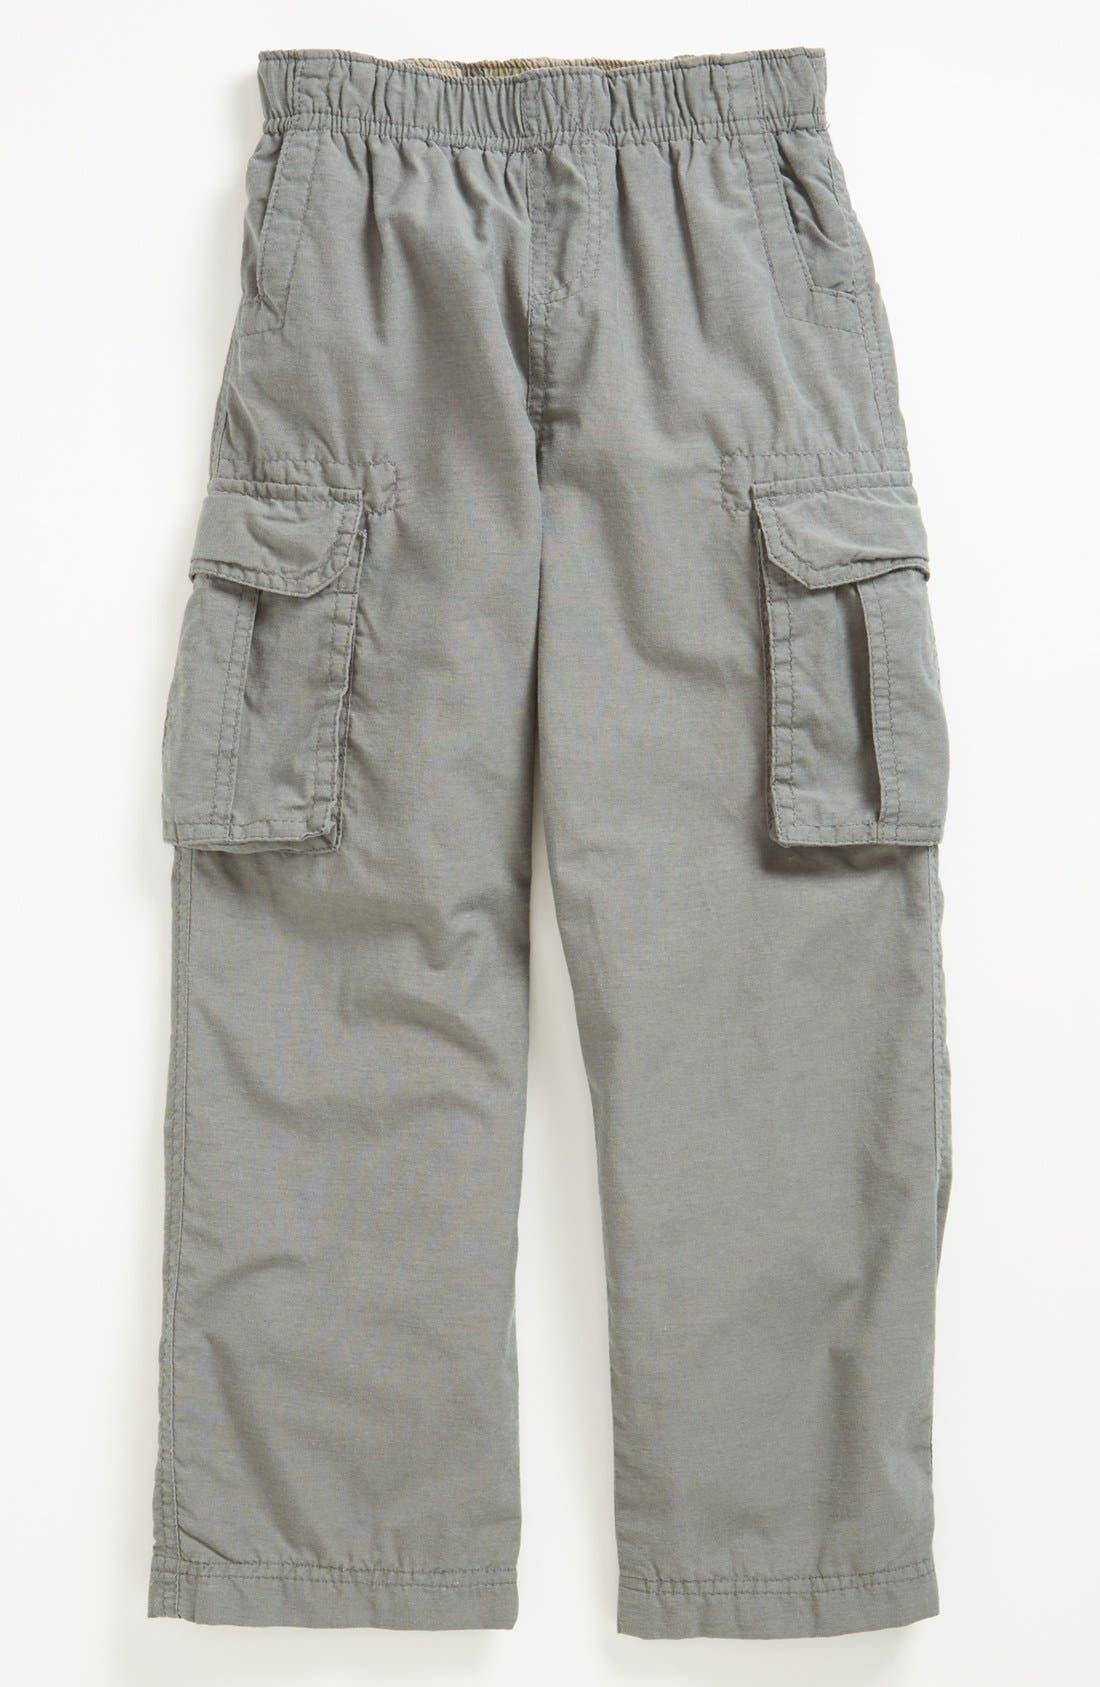 Main Image - Tucker + Tate 'Zephyr' Cargo Pants (Little Boys)